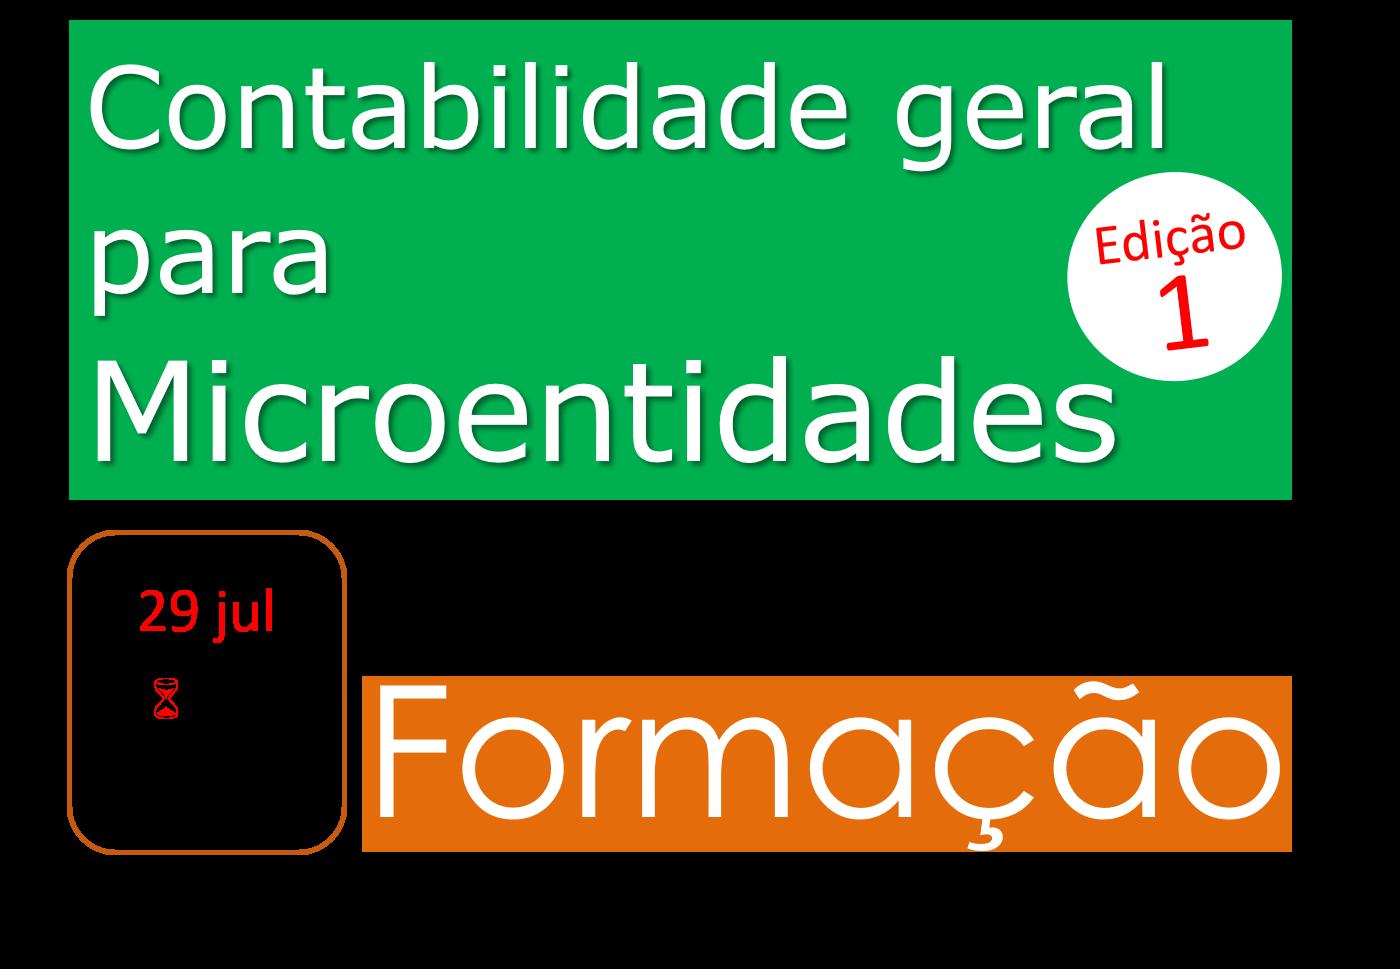 Contabilidade geral para Microentidades – 29/jul